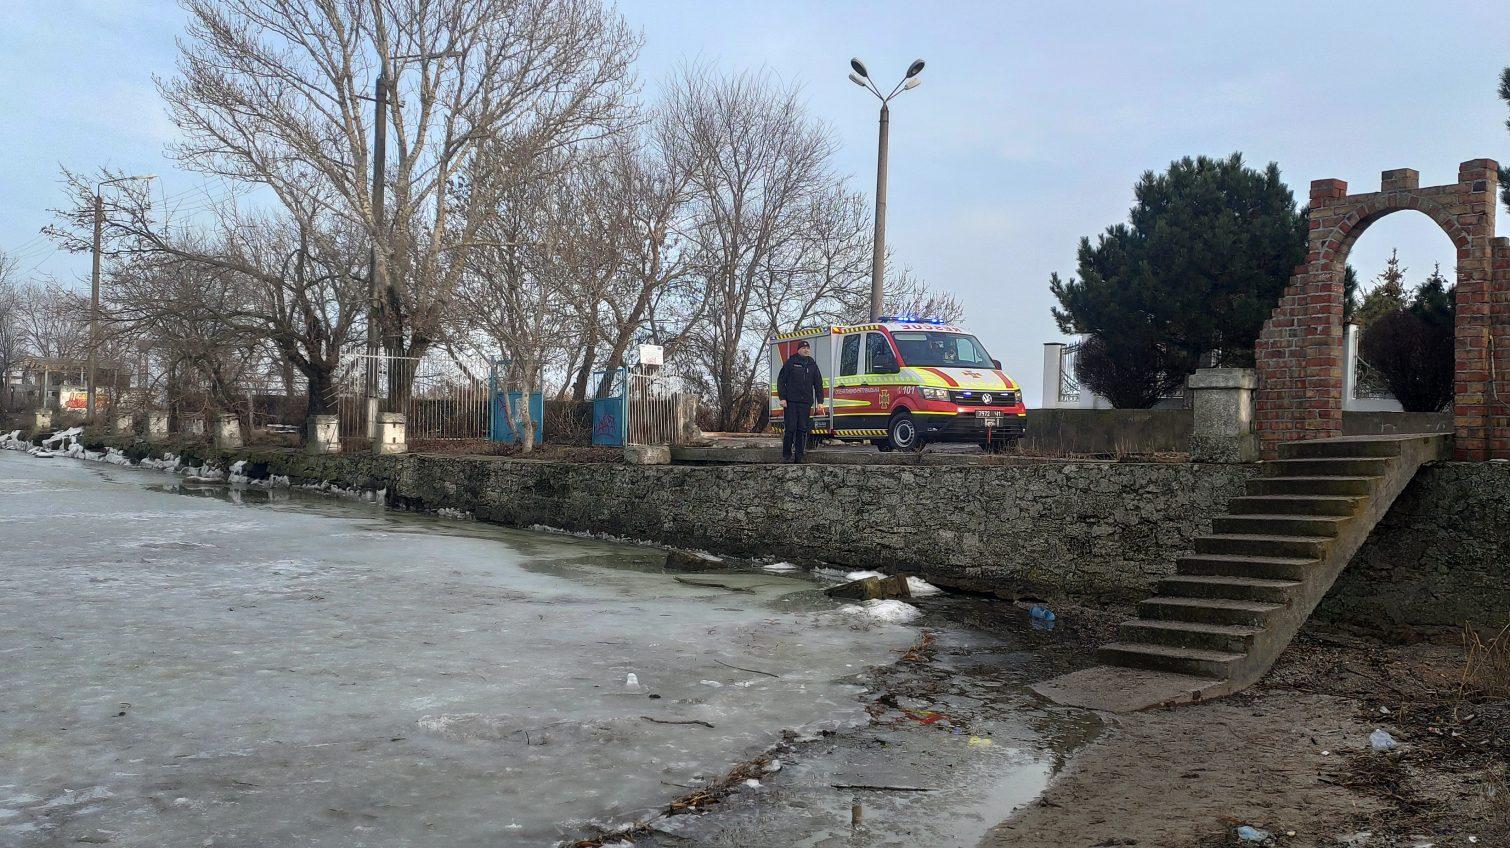 Опасная прогулка: в Аккермане 15 подростков гуляли по тонкому льду (фото) «фото»